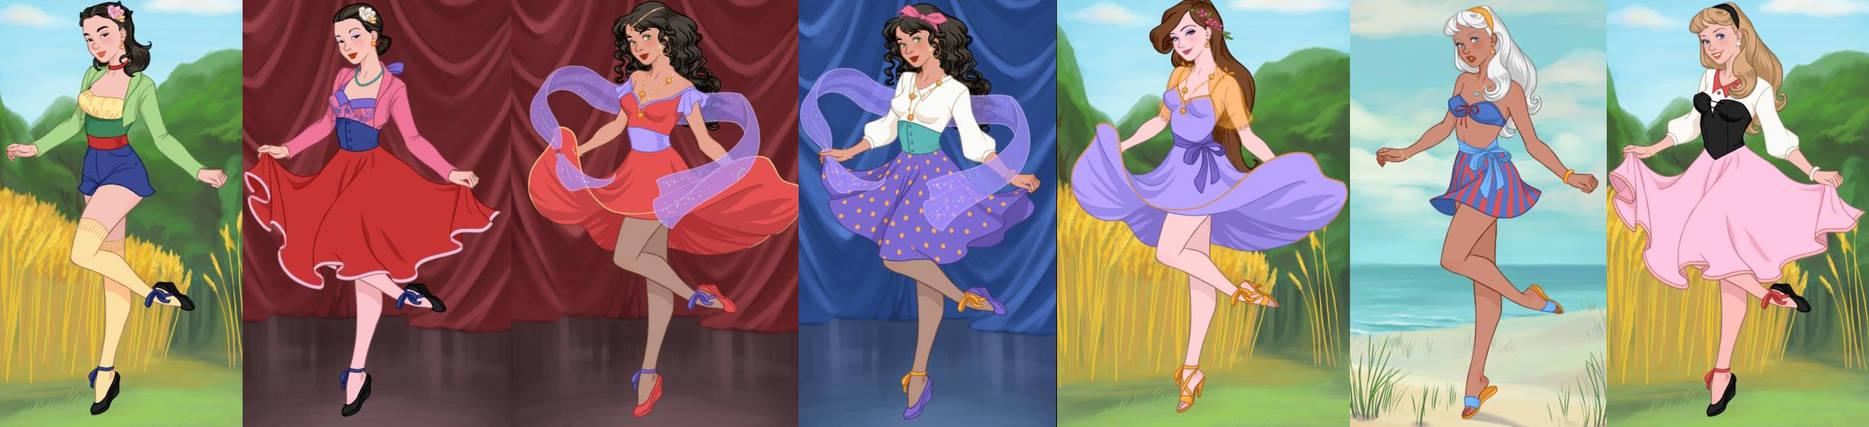 Pin Up Princesses 6